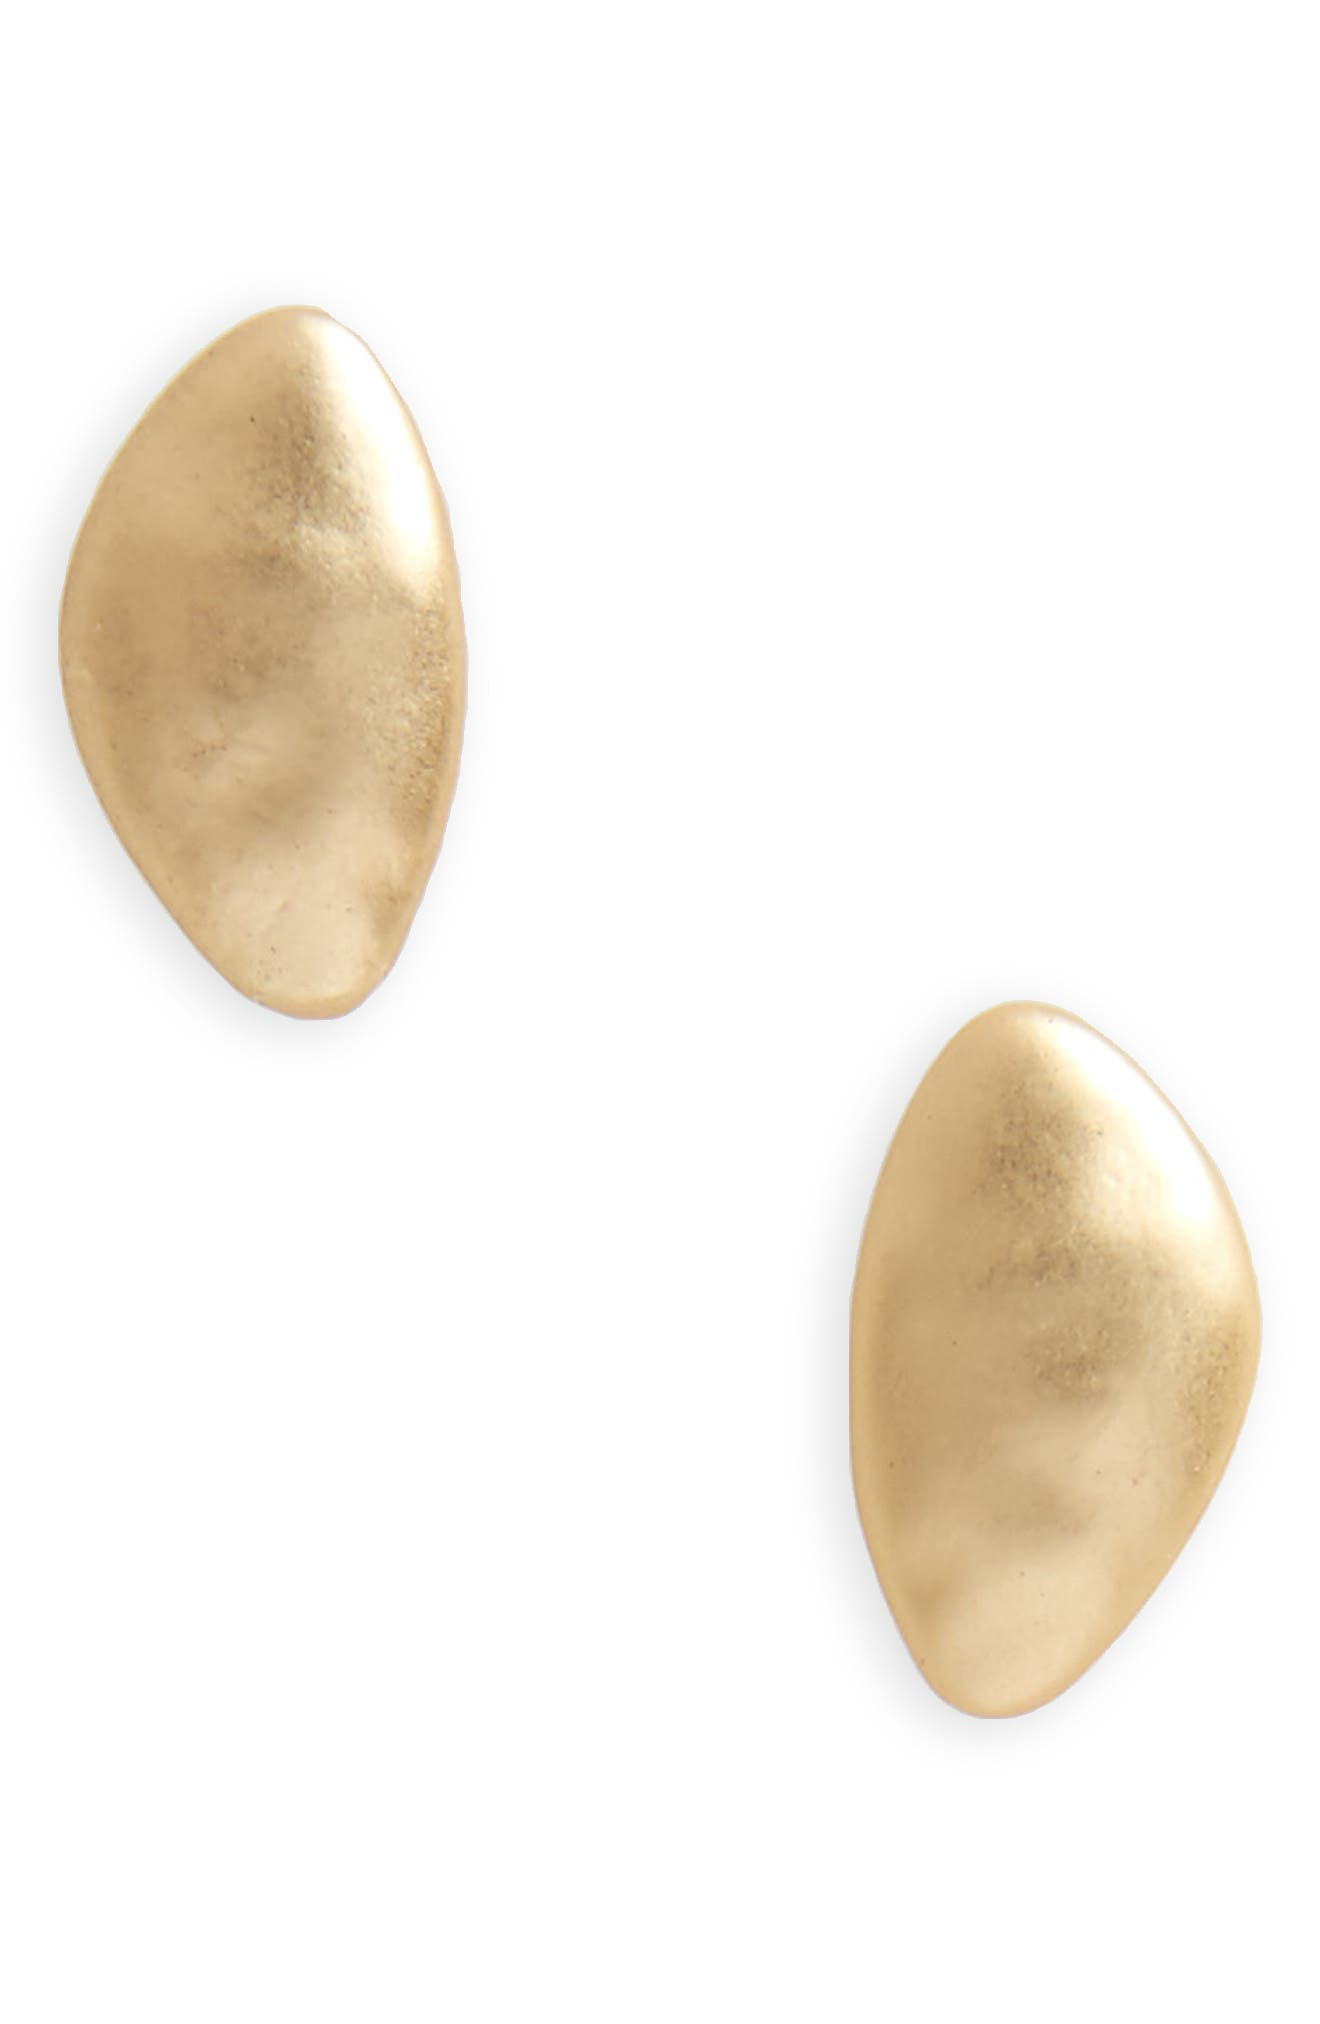 Brushed Metal Stud Earrings,                             Main thumbnail 1, color,                             Worn Gold